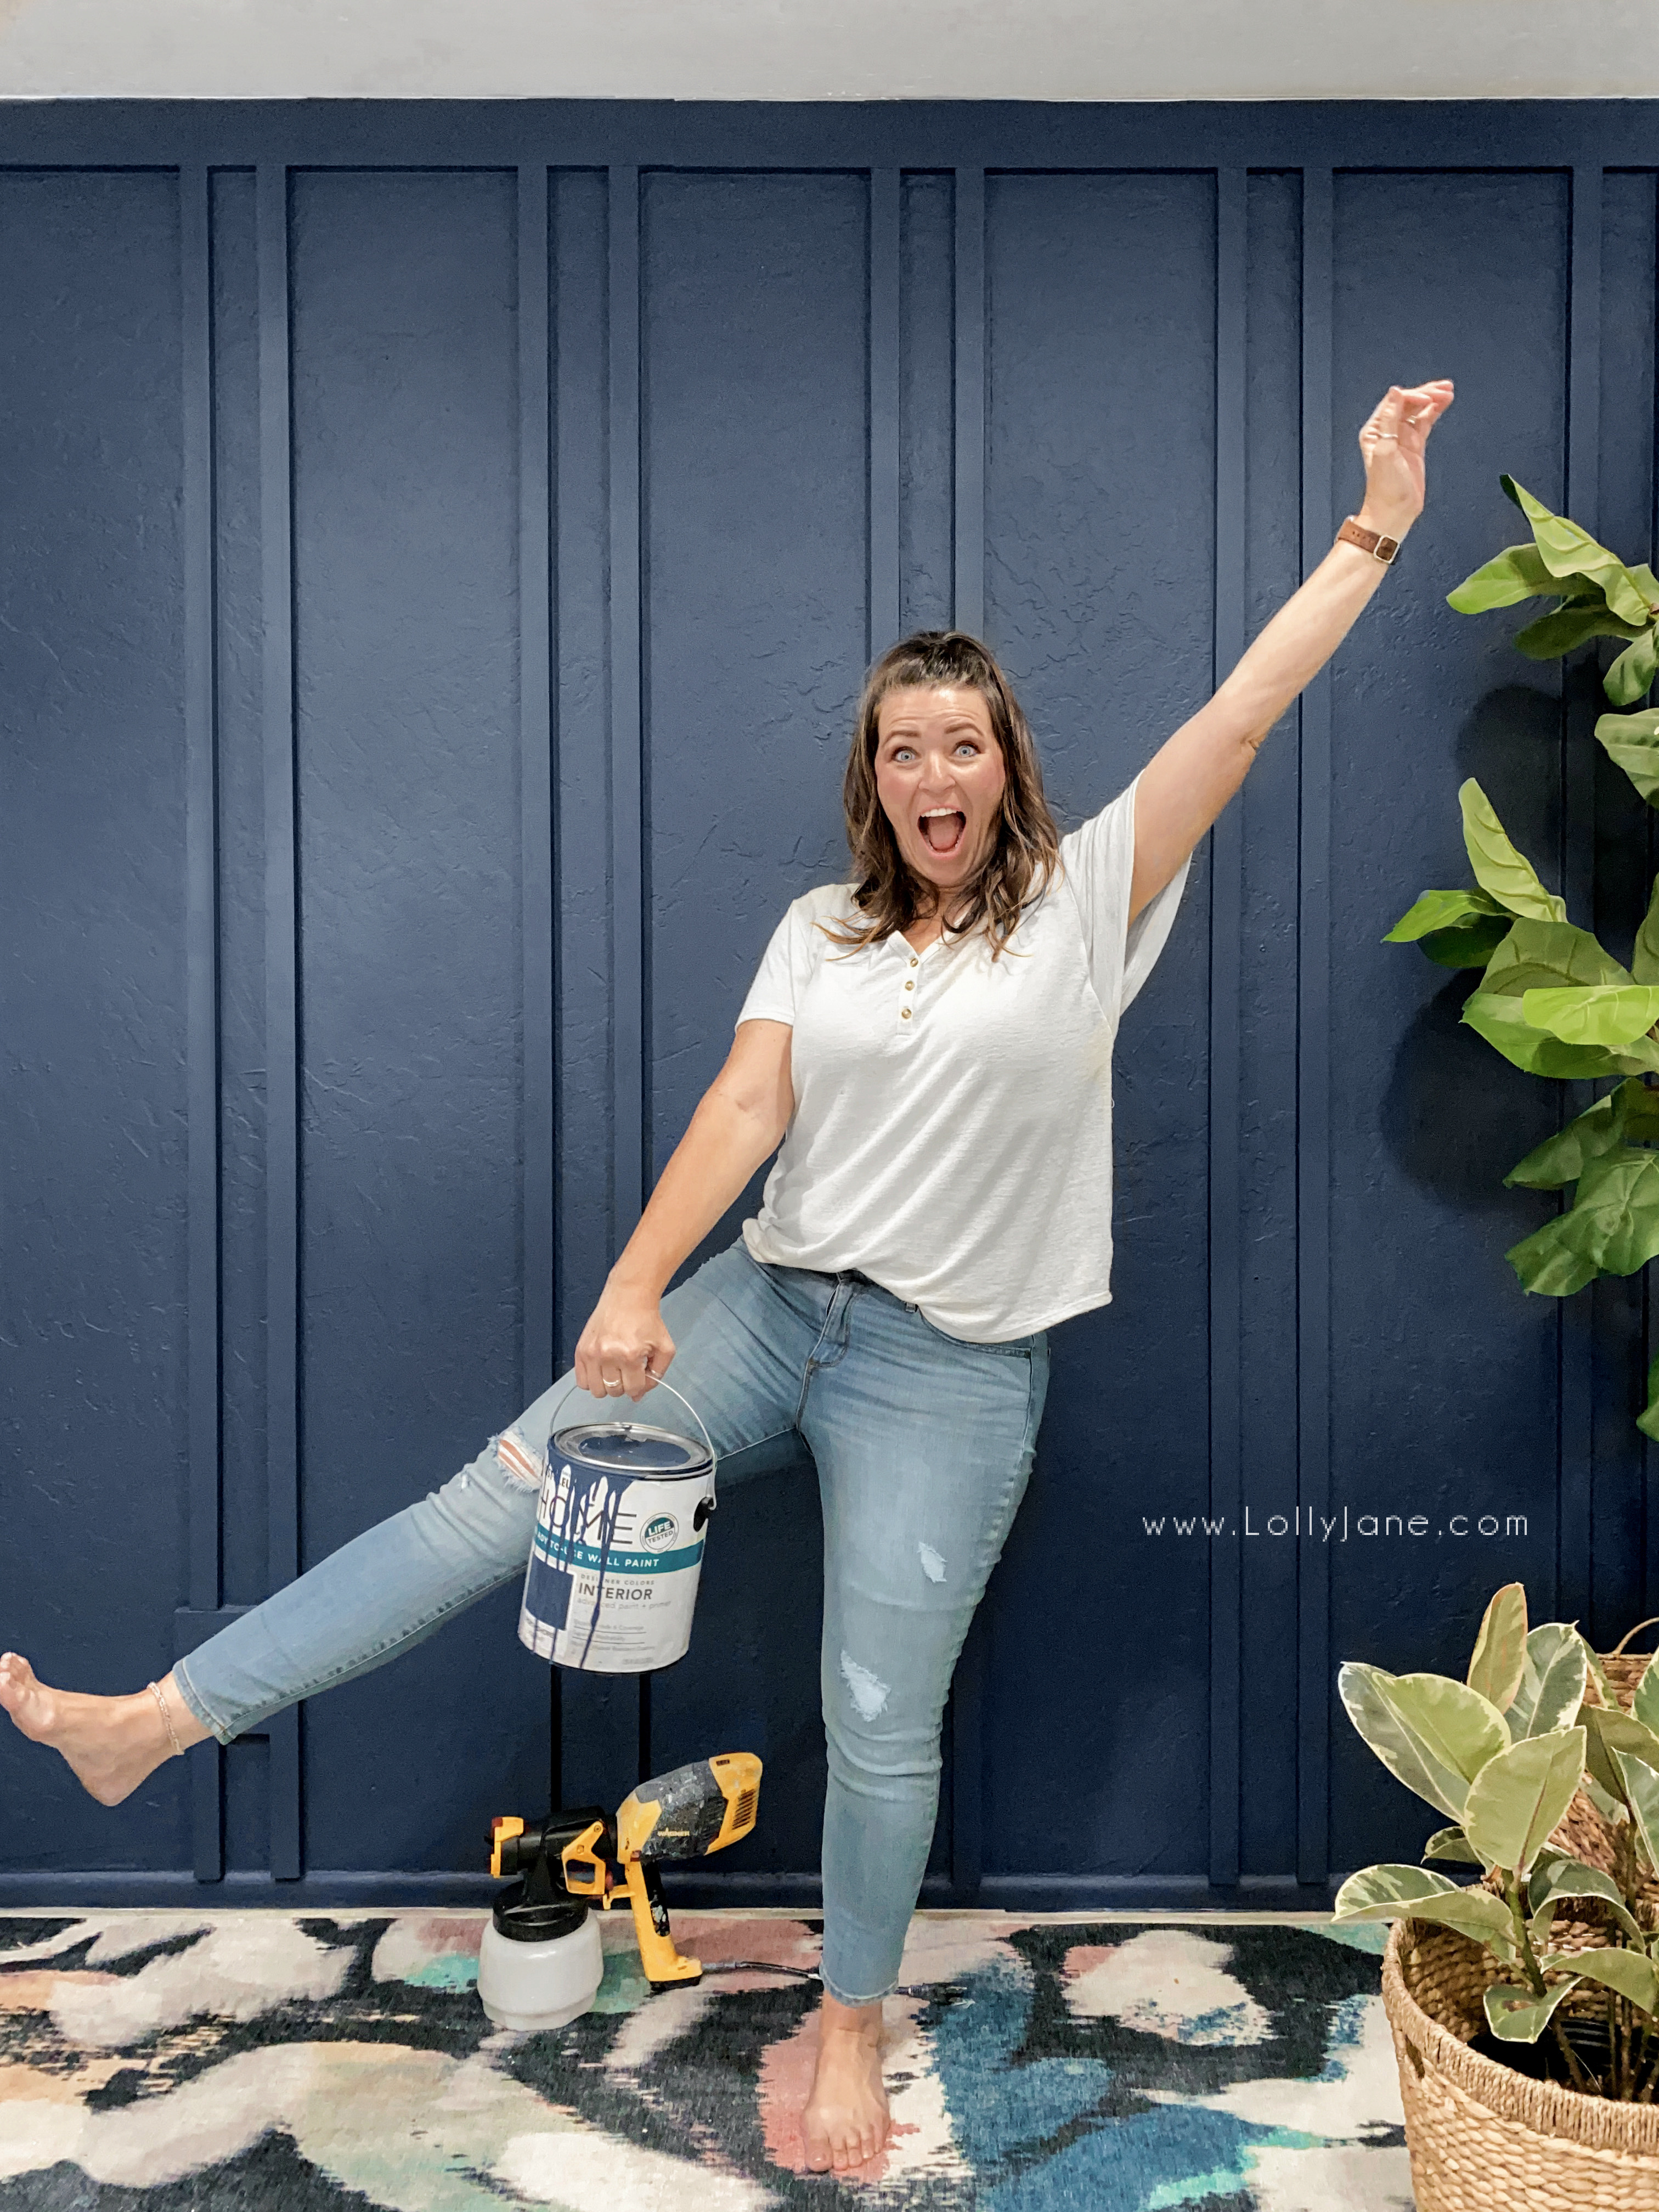 Loving our new double batten wall treatment! Love a trendy wood wall treatment and this double batten doesn't disappoint! #boardandbatten #modernfarmhouse #bohofarmhouse #bohochicdiningroom #howtopaintawall #diydoublebatten #diydoublebattenwalltreatment #howtopaintadiningroomwall #whatwallpainttouseforadiningroom